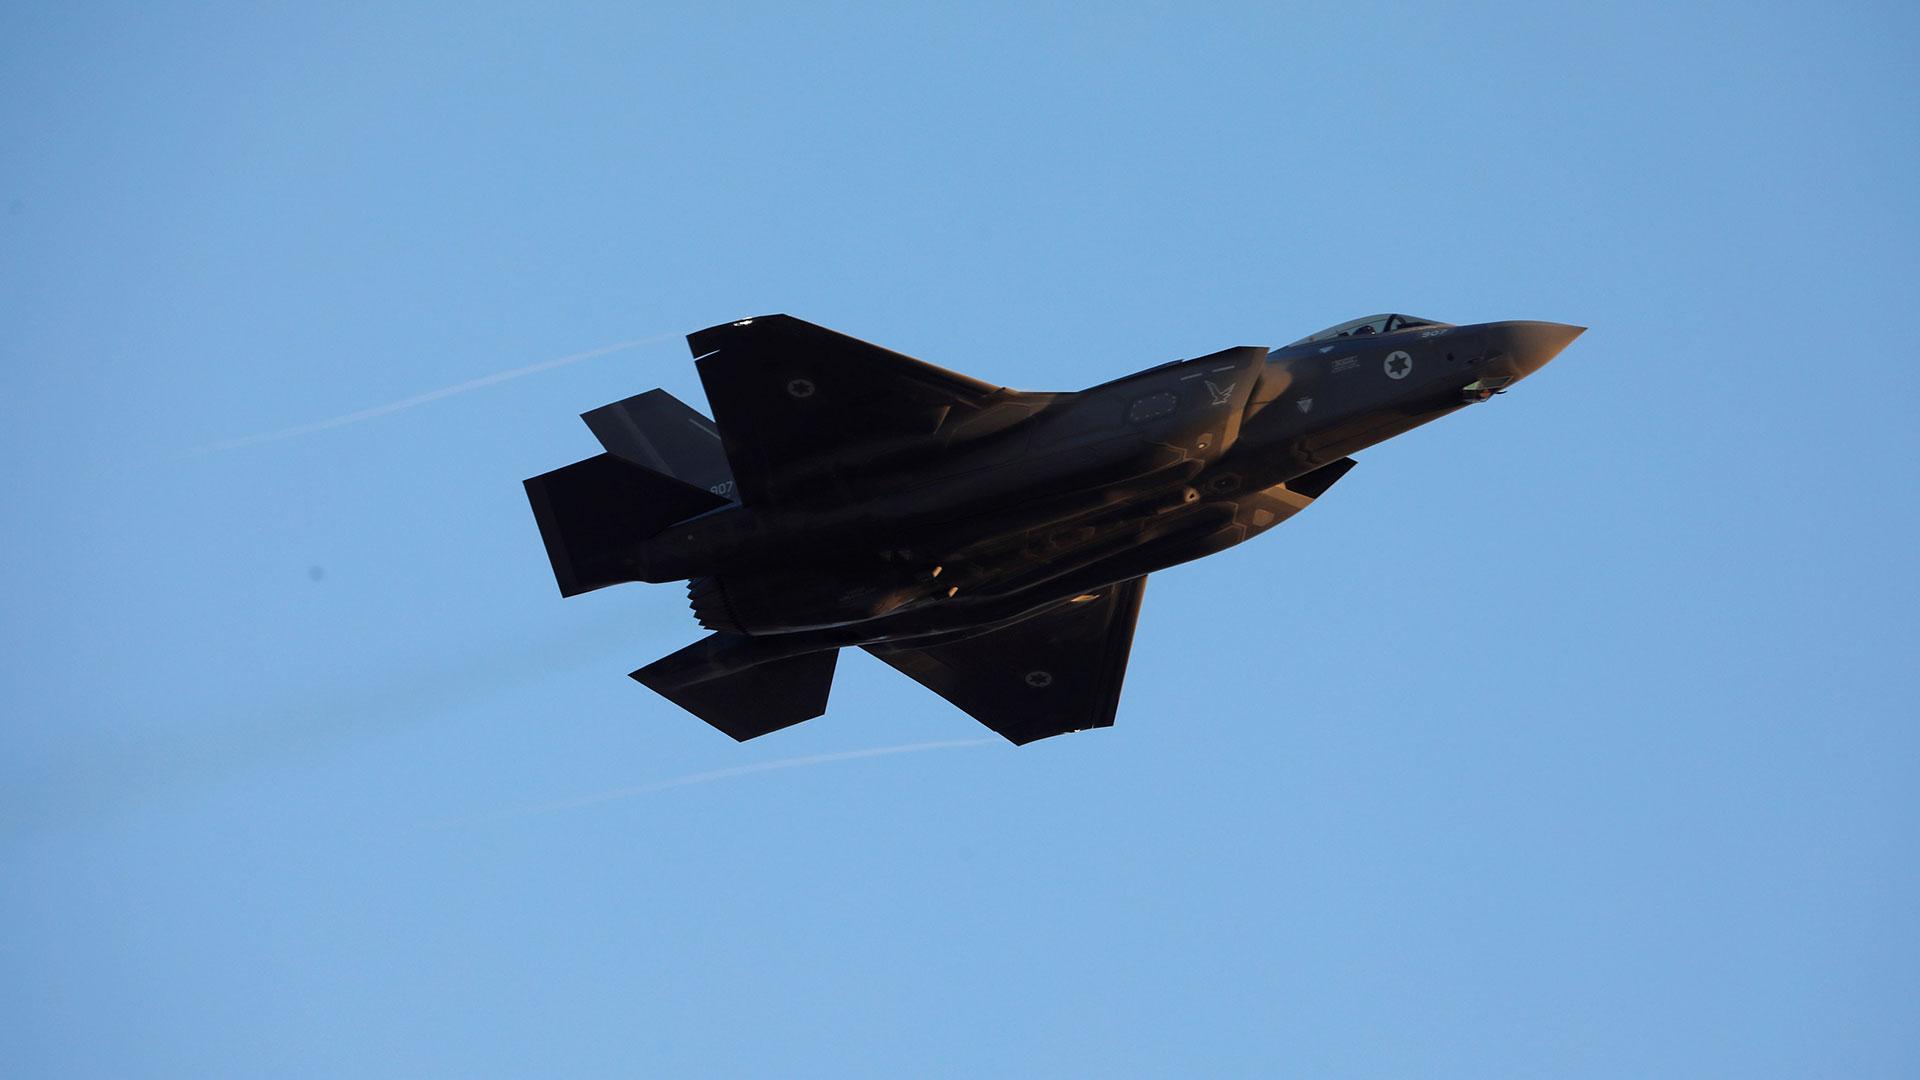 Un caza furtivo F-35 de la fuerza aérea israelí (Reuters)